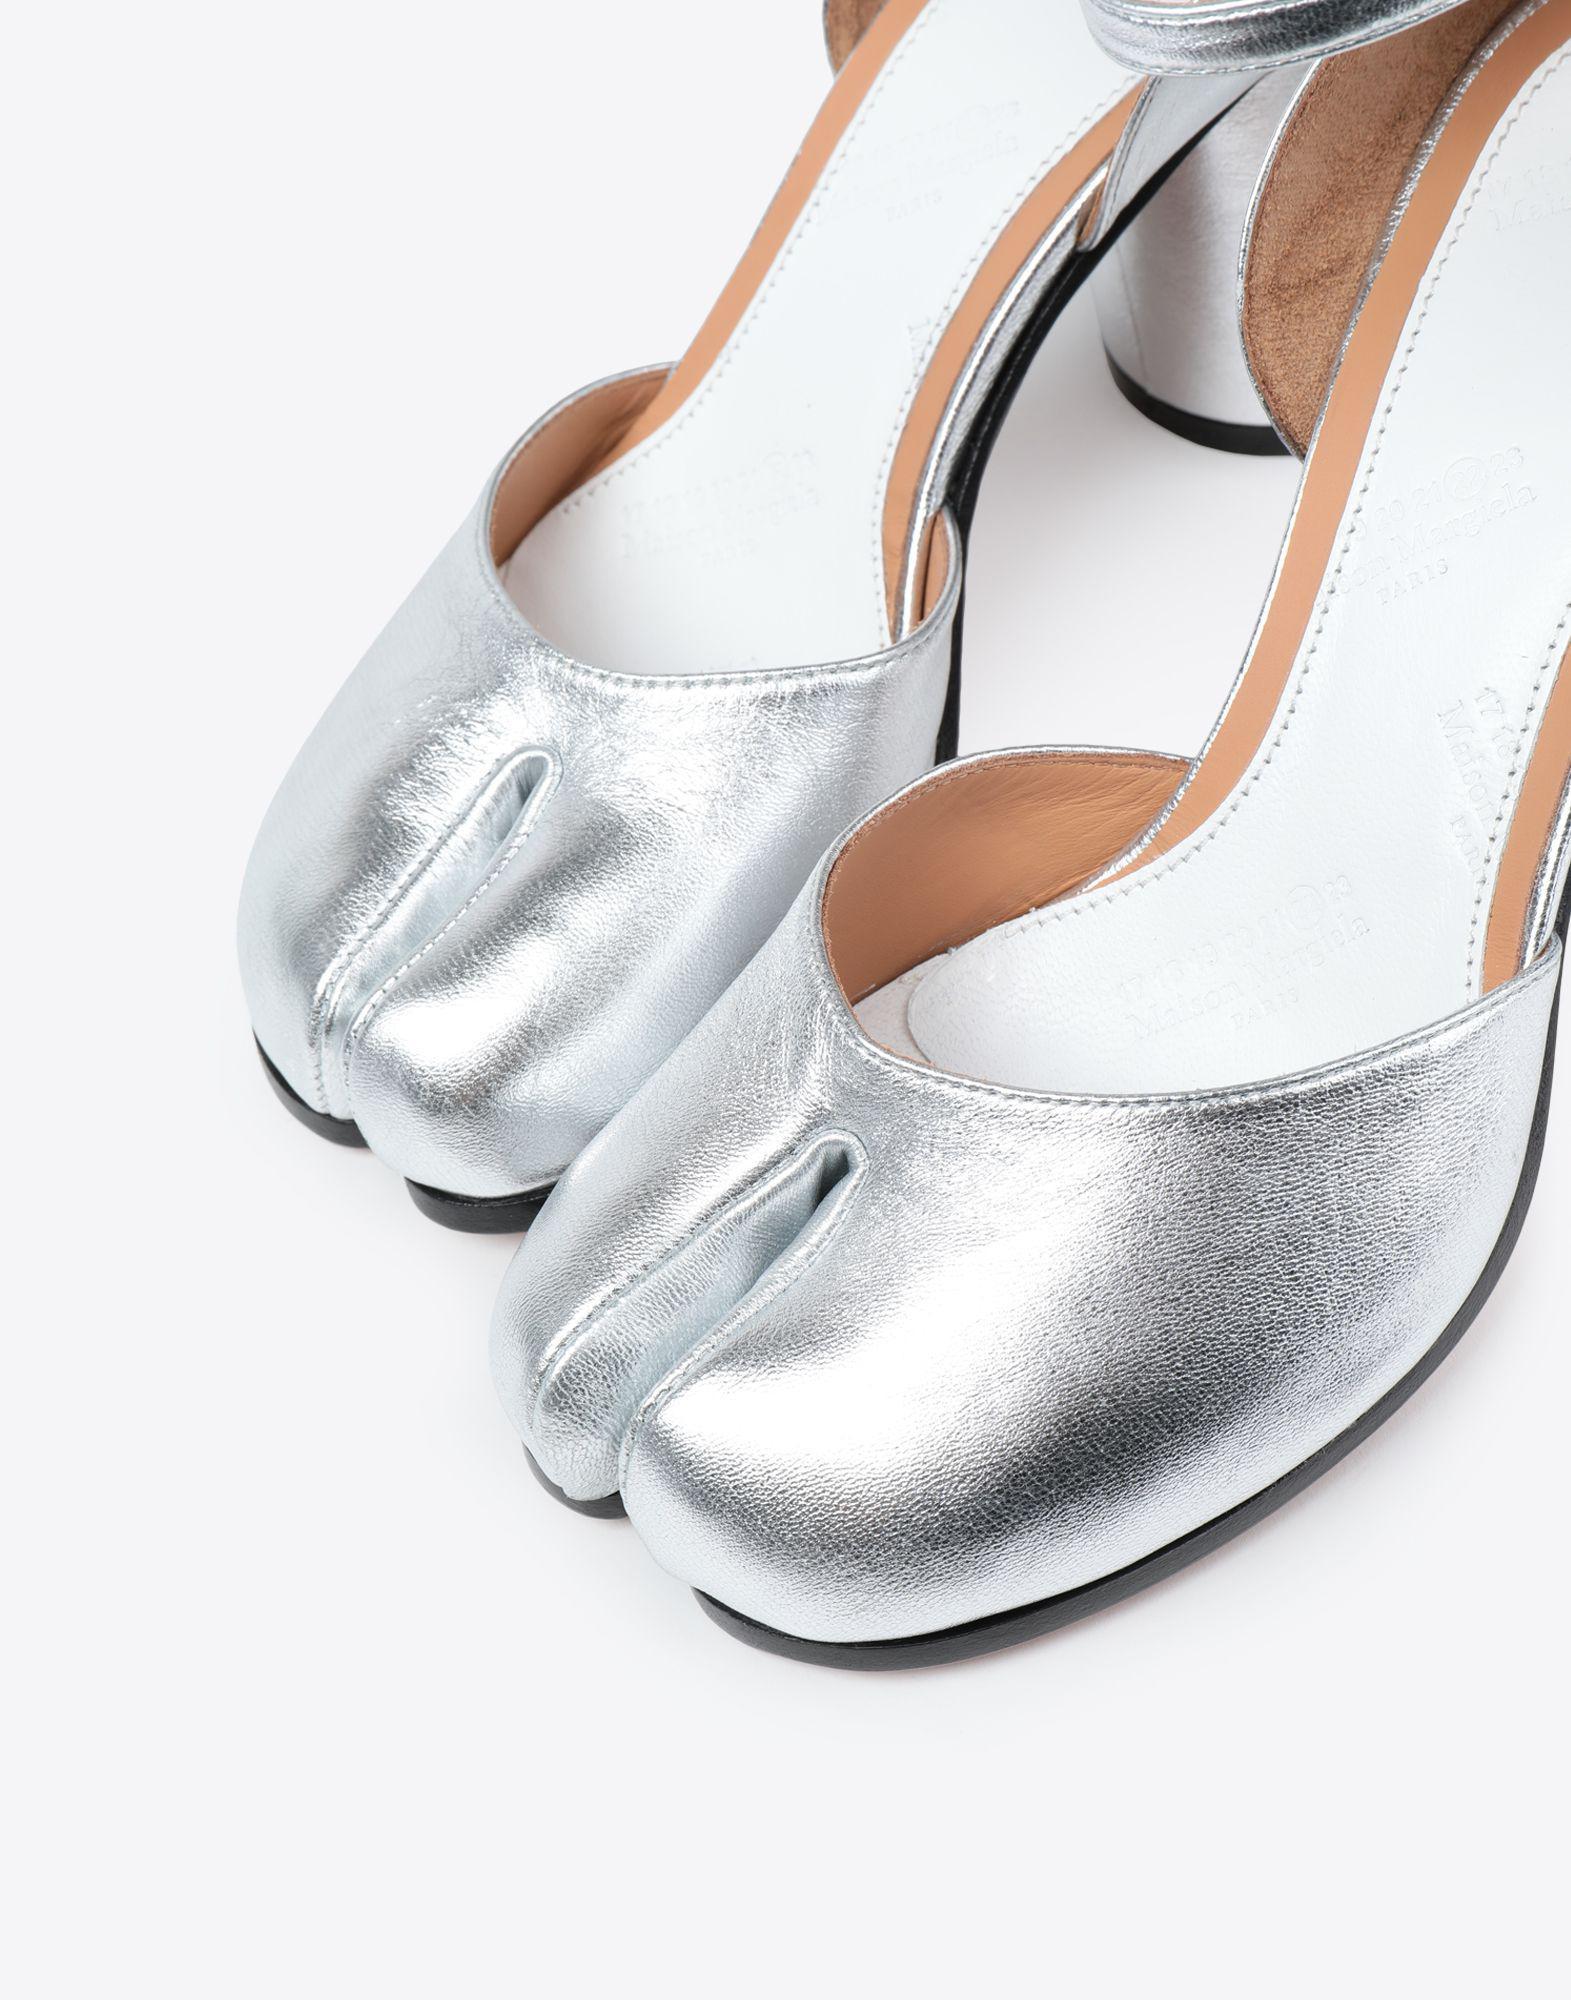 789b3260893b Lyst - Maison Margiela Silver Tabi Sandals in Metallic - Save 49%